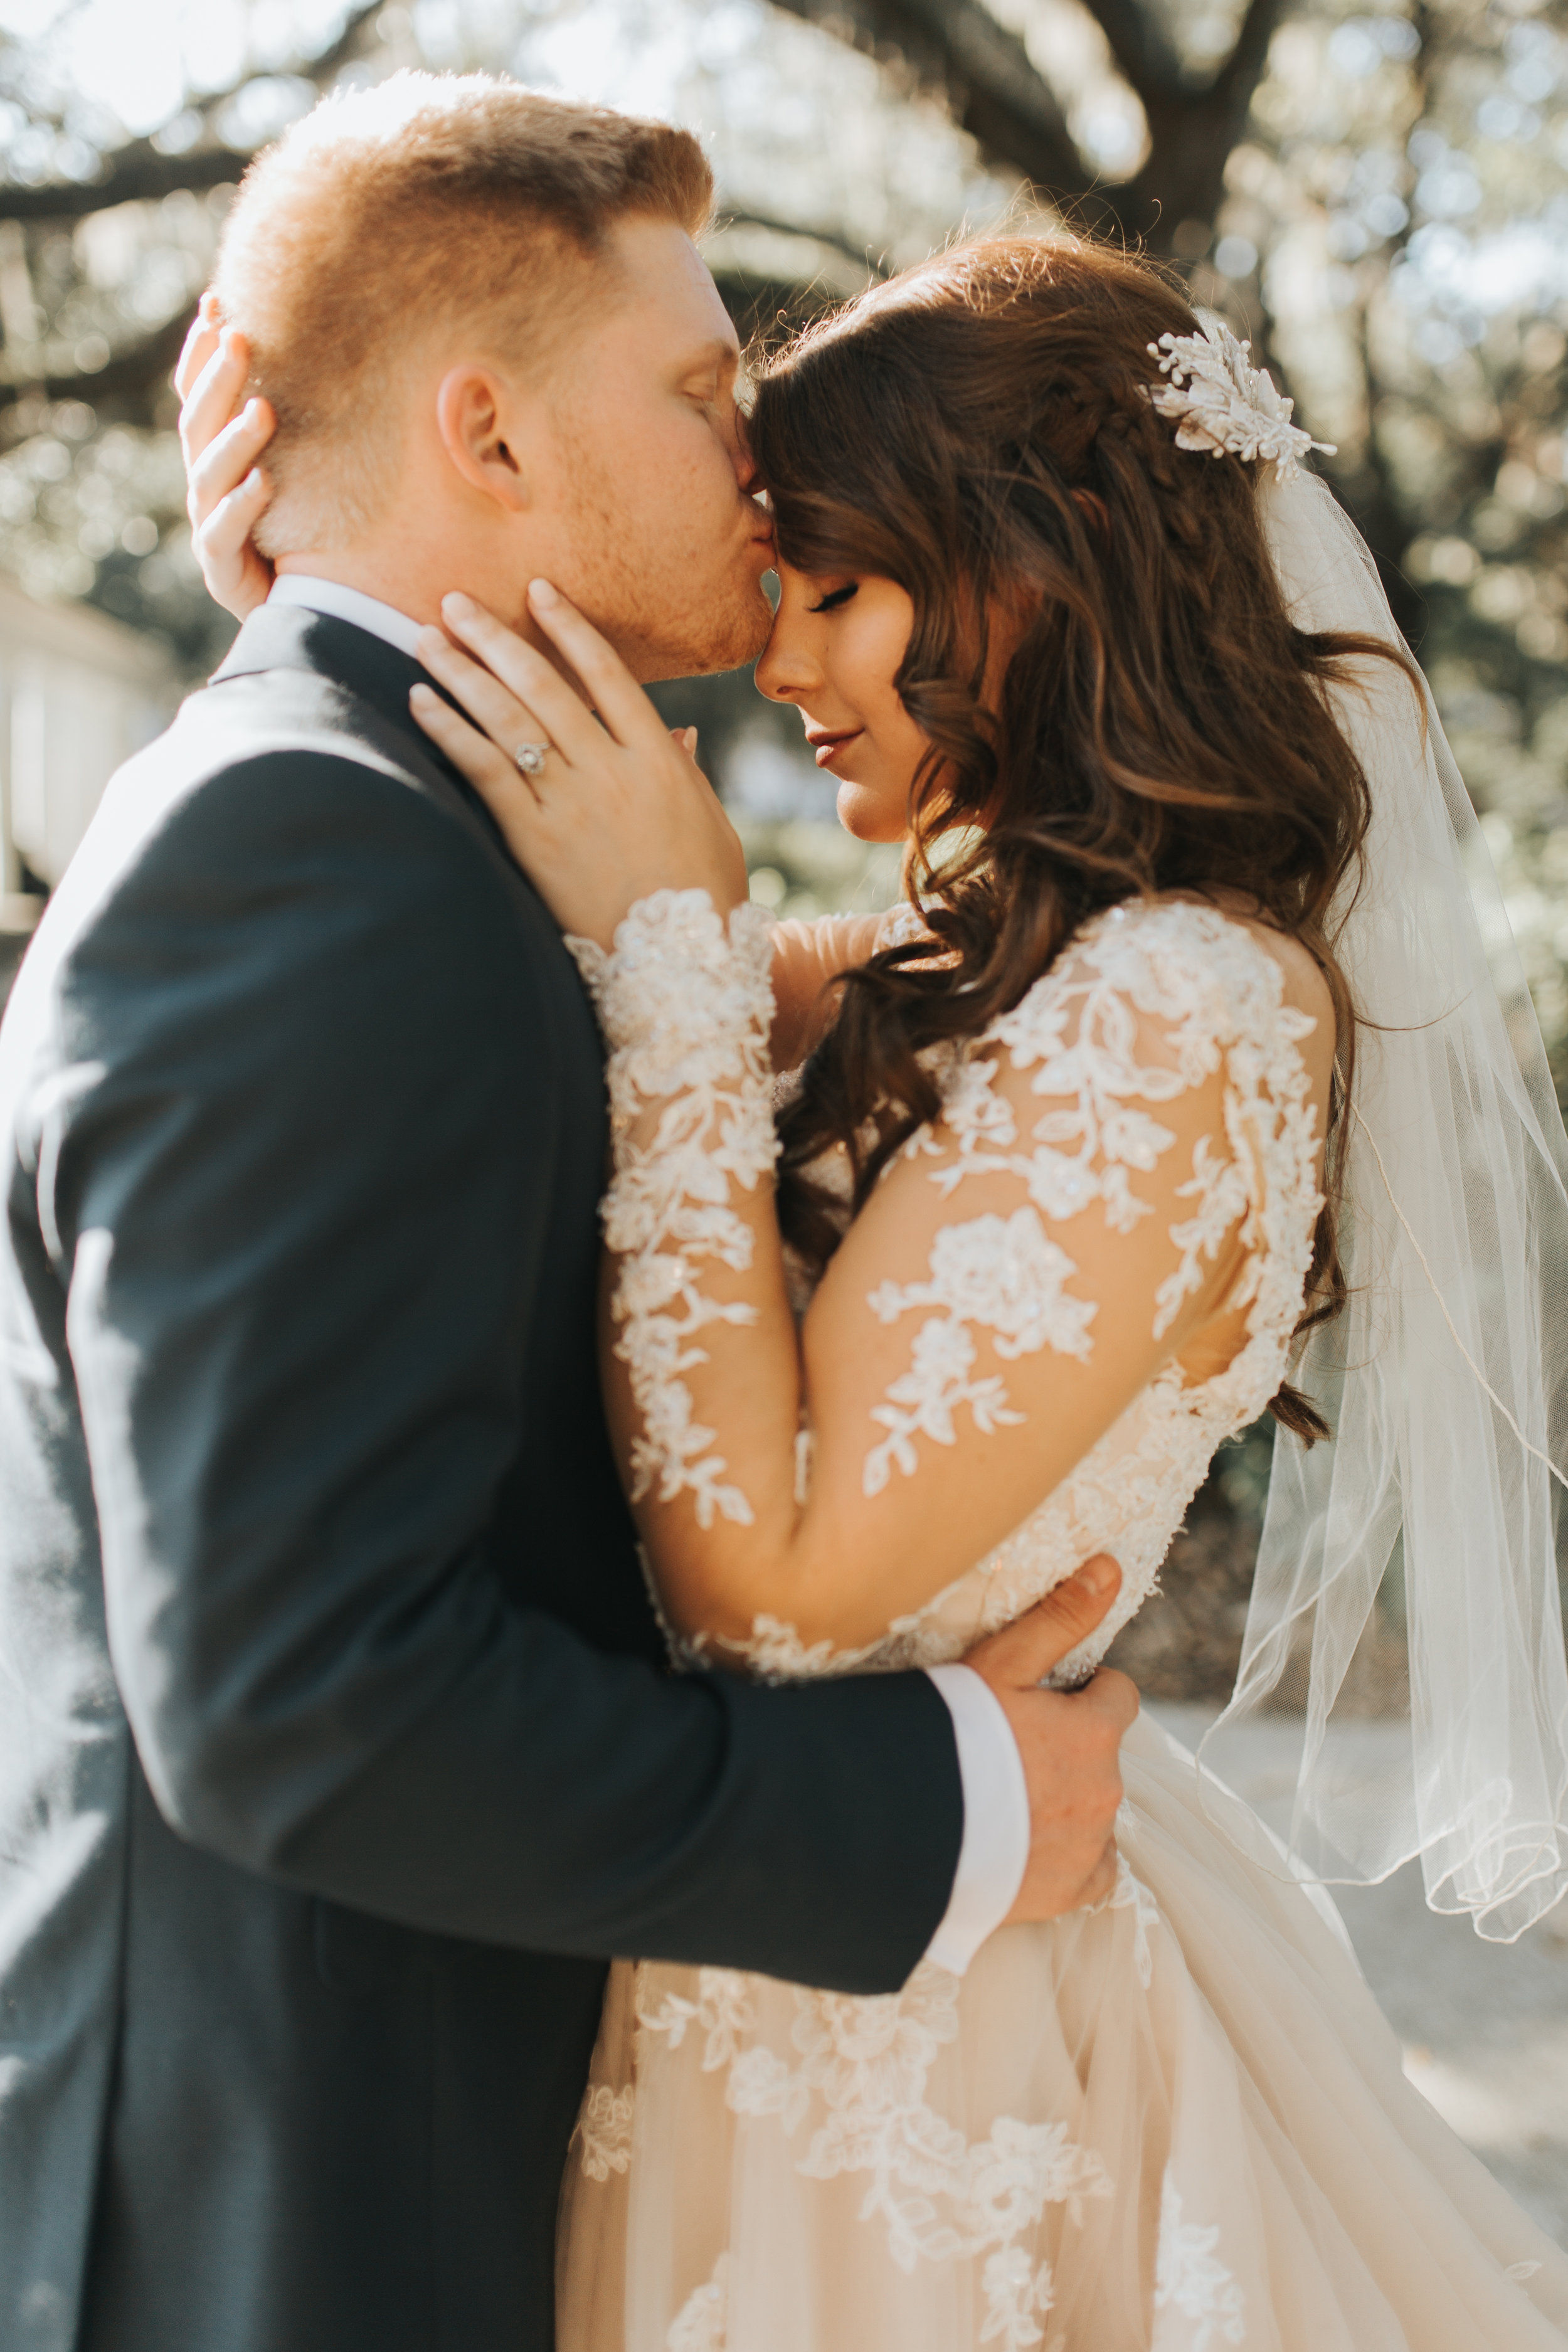 Richmond wedding photographer, Virginia wedding photographer, Destination wedding photographer, Savannah Georgia wedding photographer, Charlottesville wedding photographer, 489.JPG